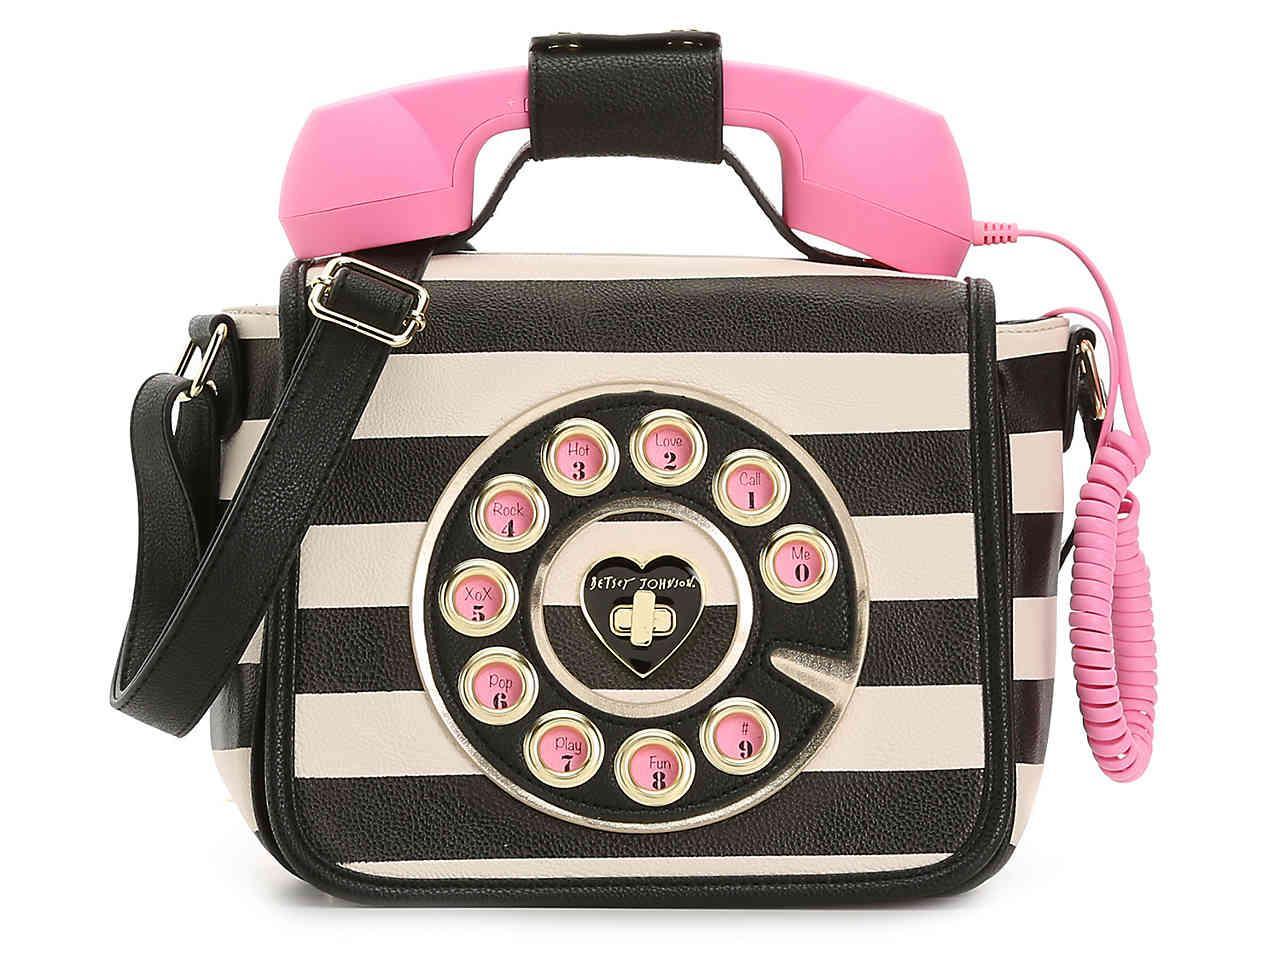 96bcbeb3c4b6 Lyst - Betsey Johnson Call Me Baby Crossbody Bag in Pink